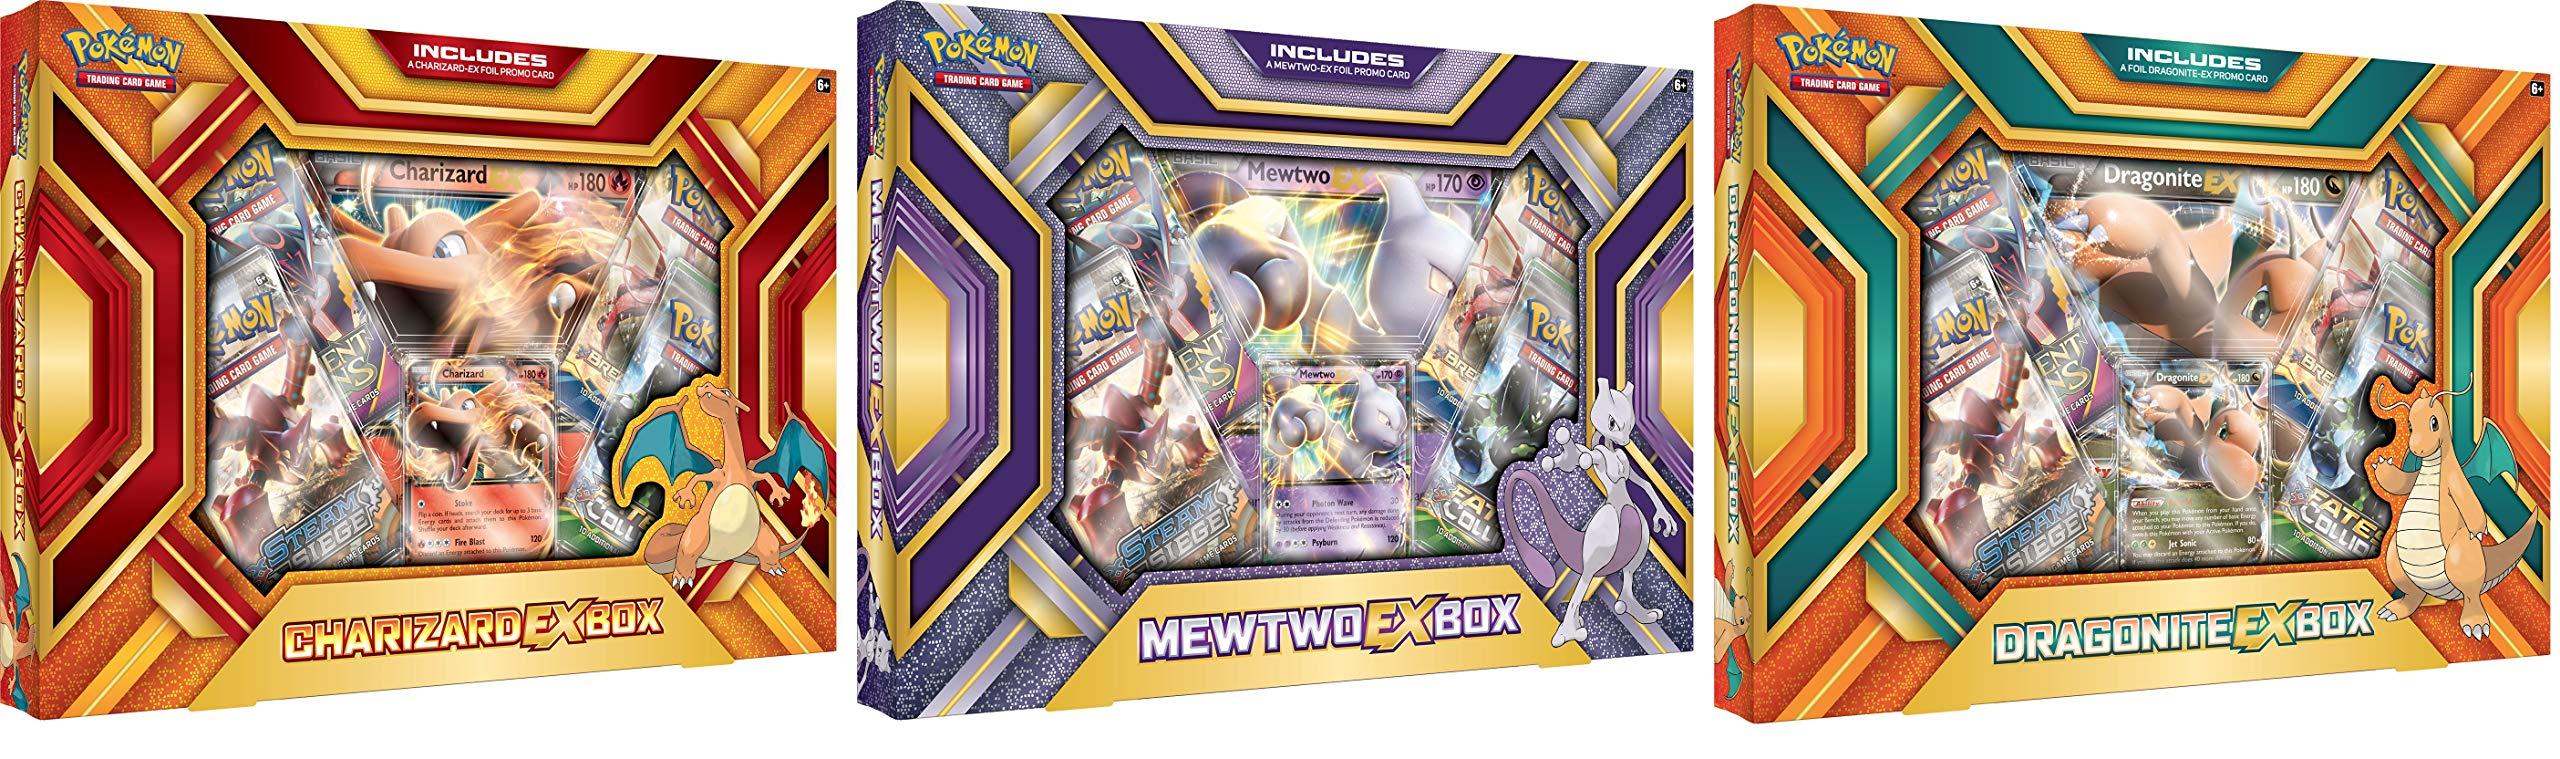 Pokémon TCG Ex Box Bundle